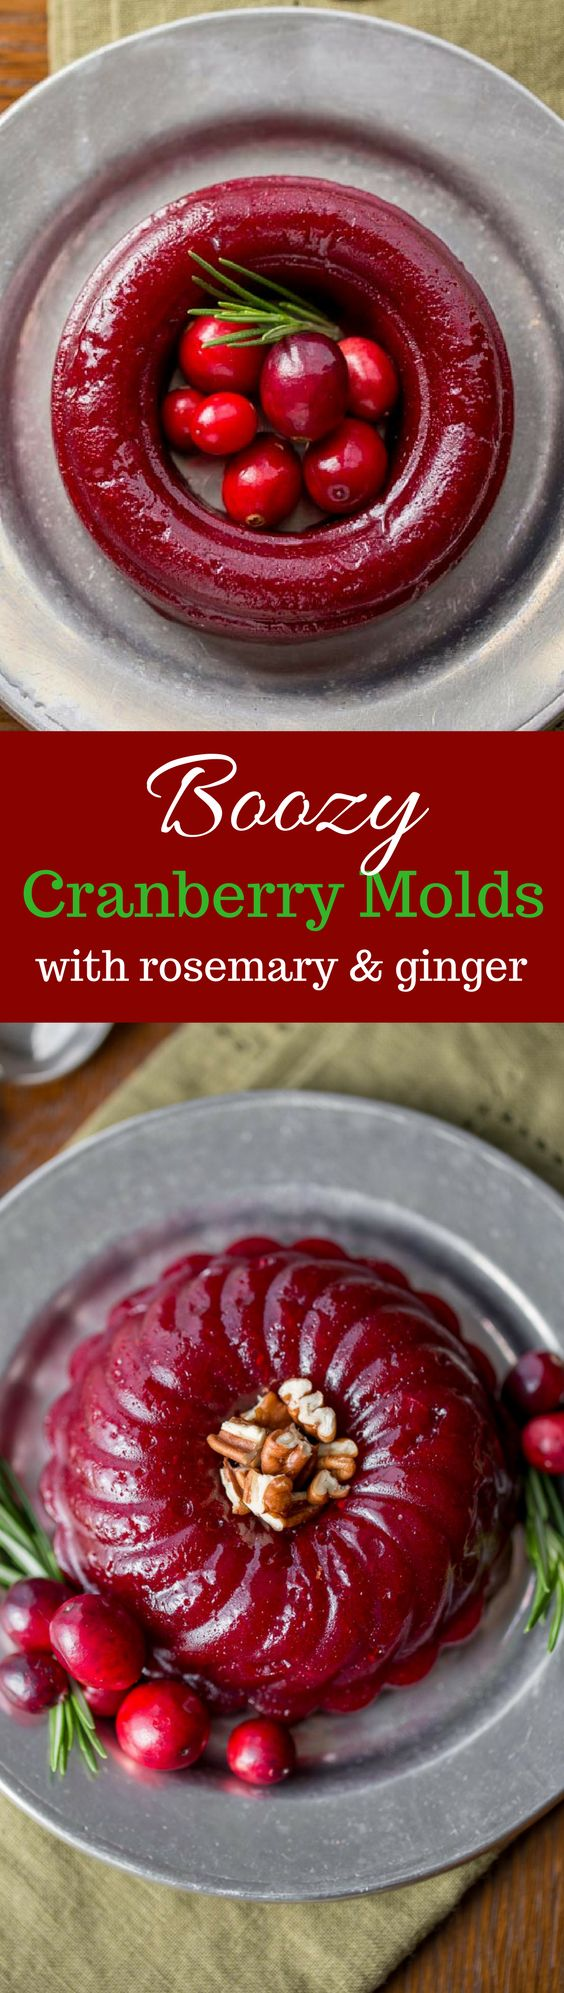 Boozy Cranberry Sauce Recipe Cranberry Sauce Cranberry Recipes